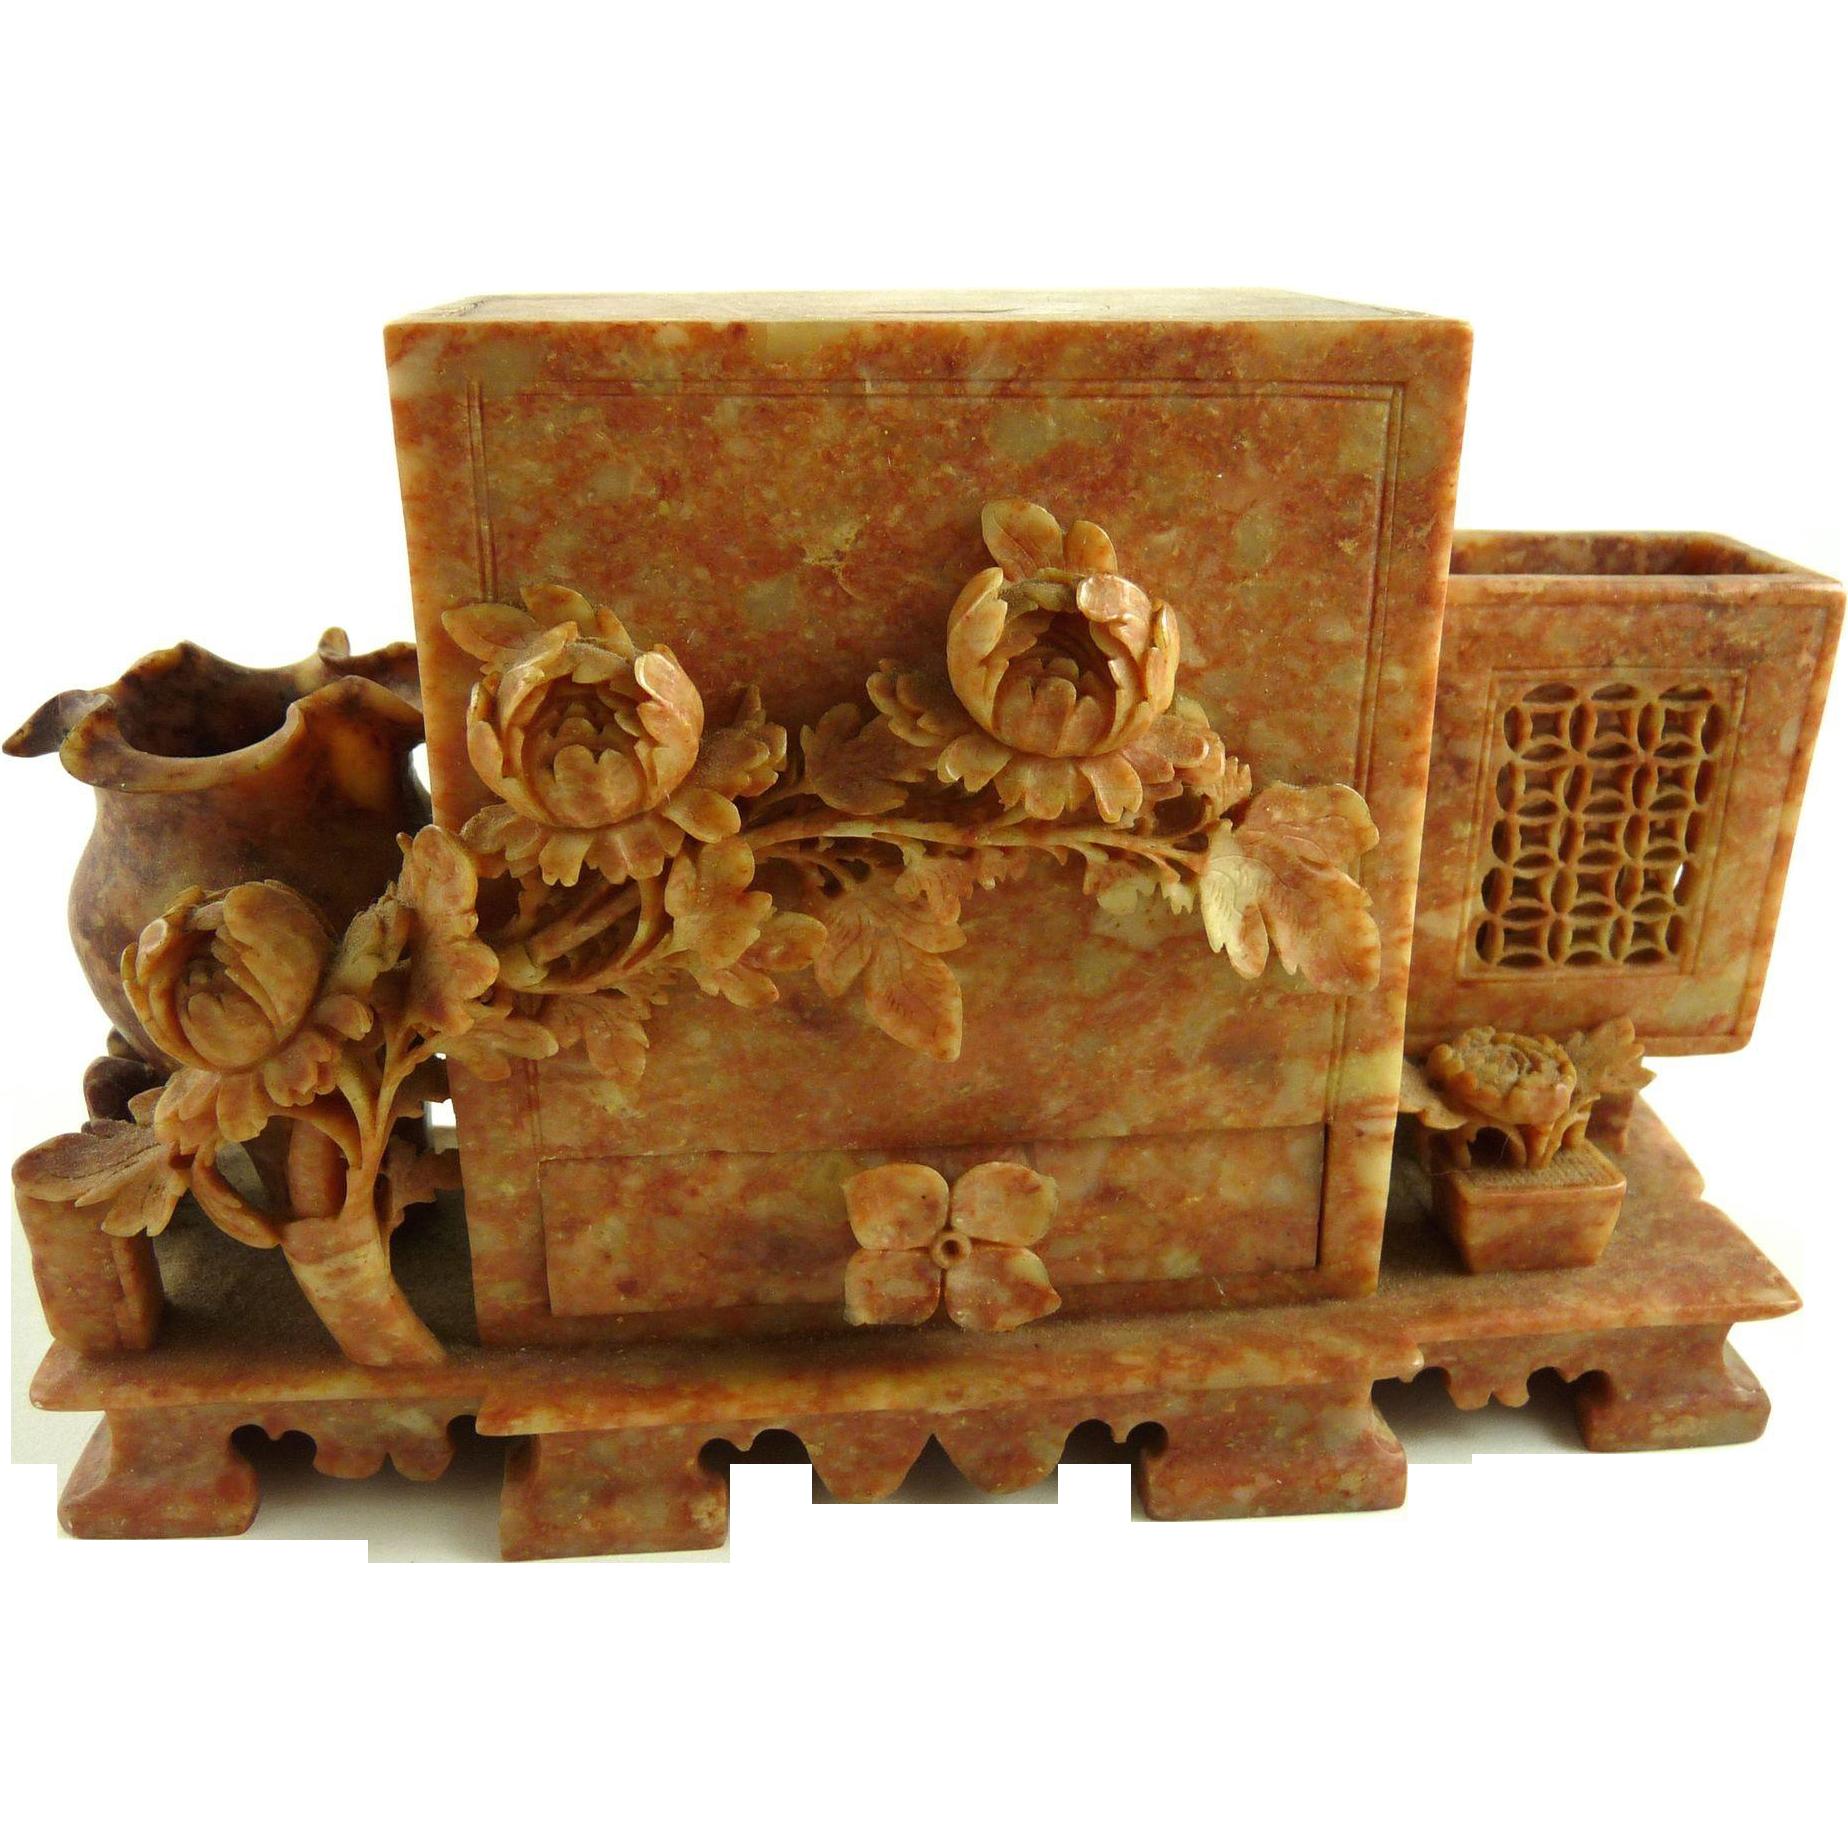 Vintage Chinese Soapstone Cigarette Dispenser Hand Carved